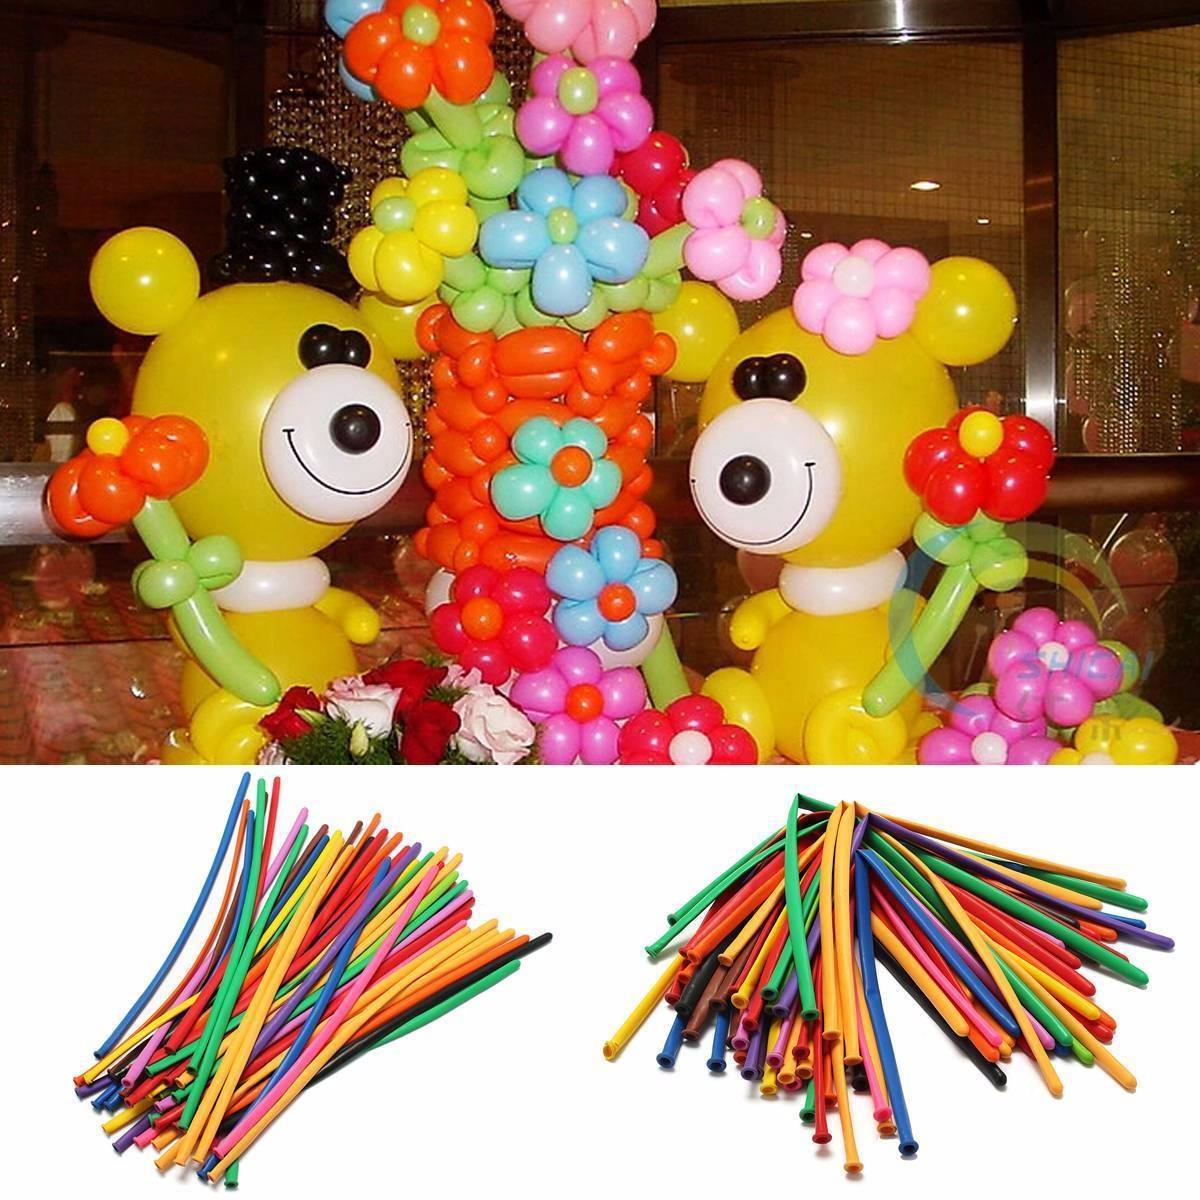 globos para cumpleaos pencil por docena decoracin with figuras de globos para cumpleaos